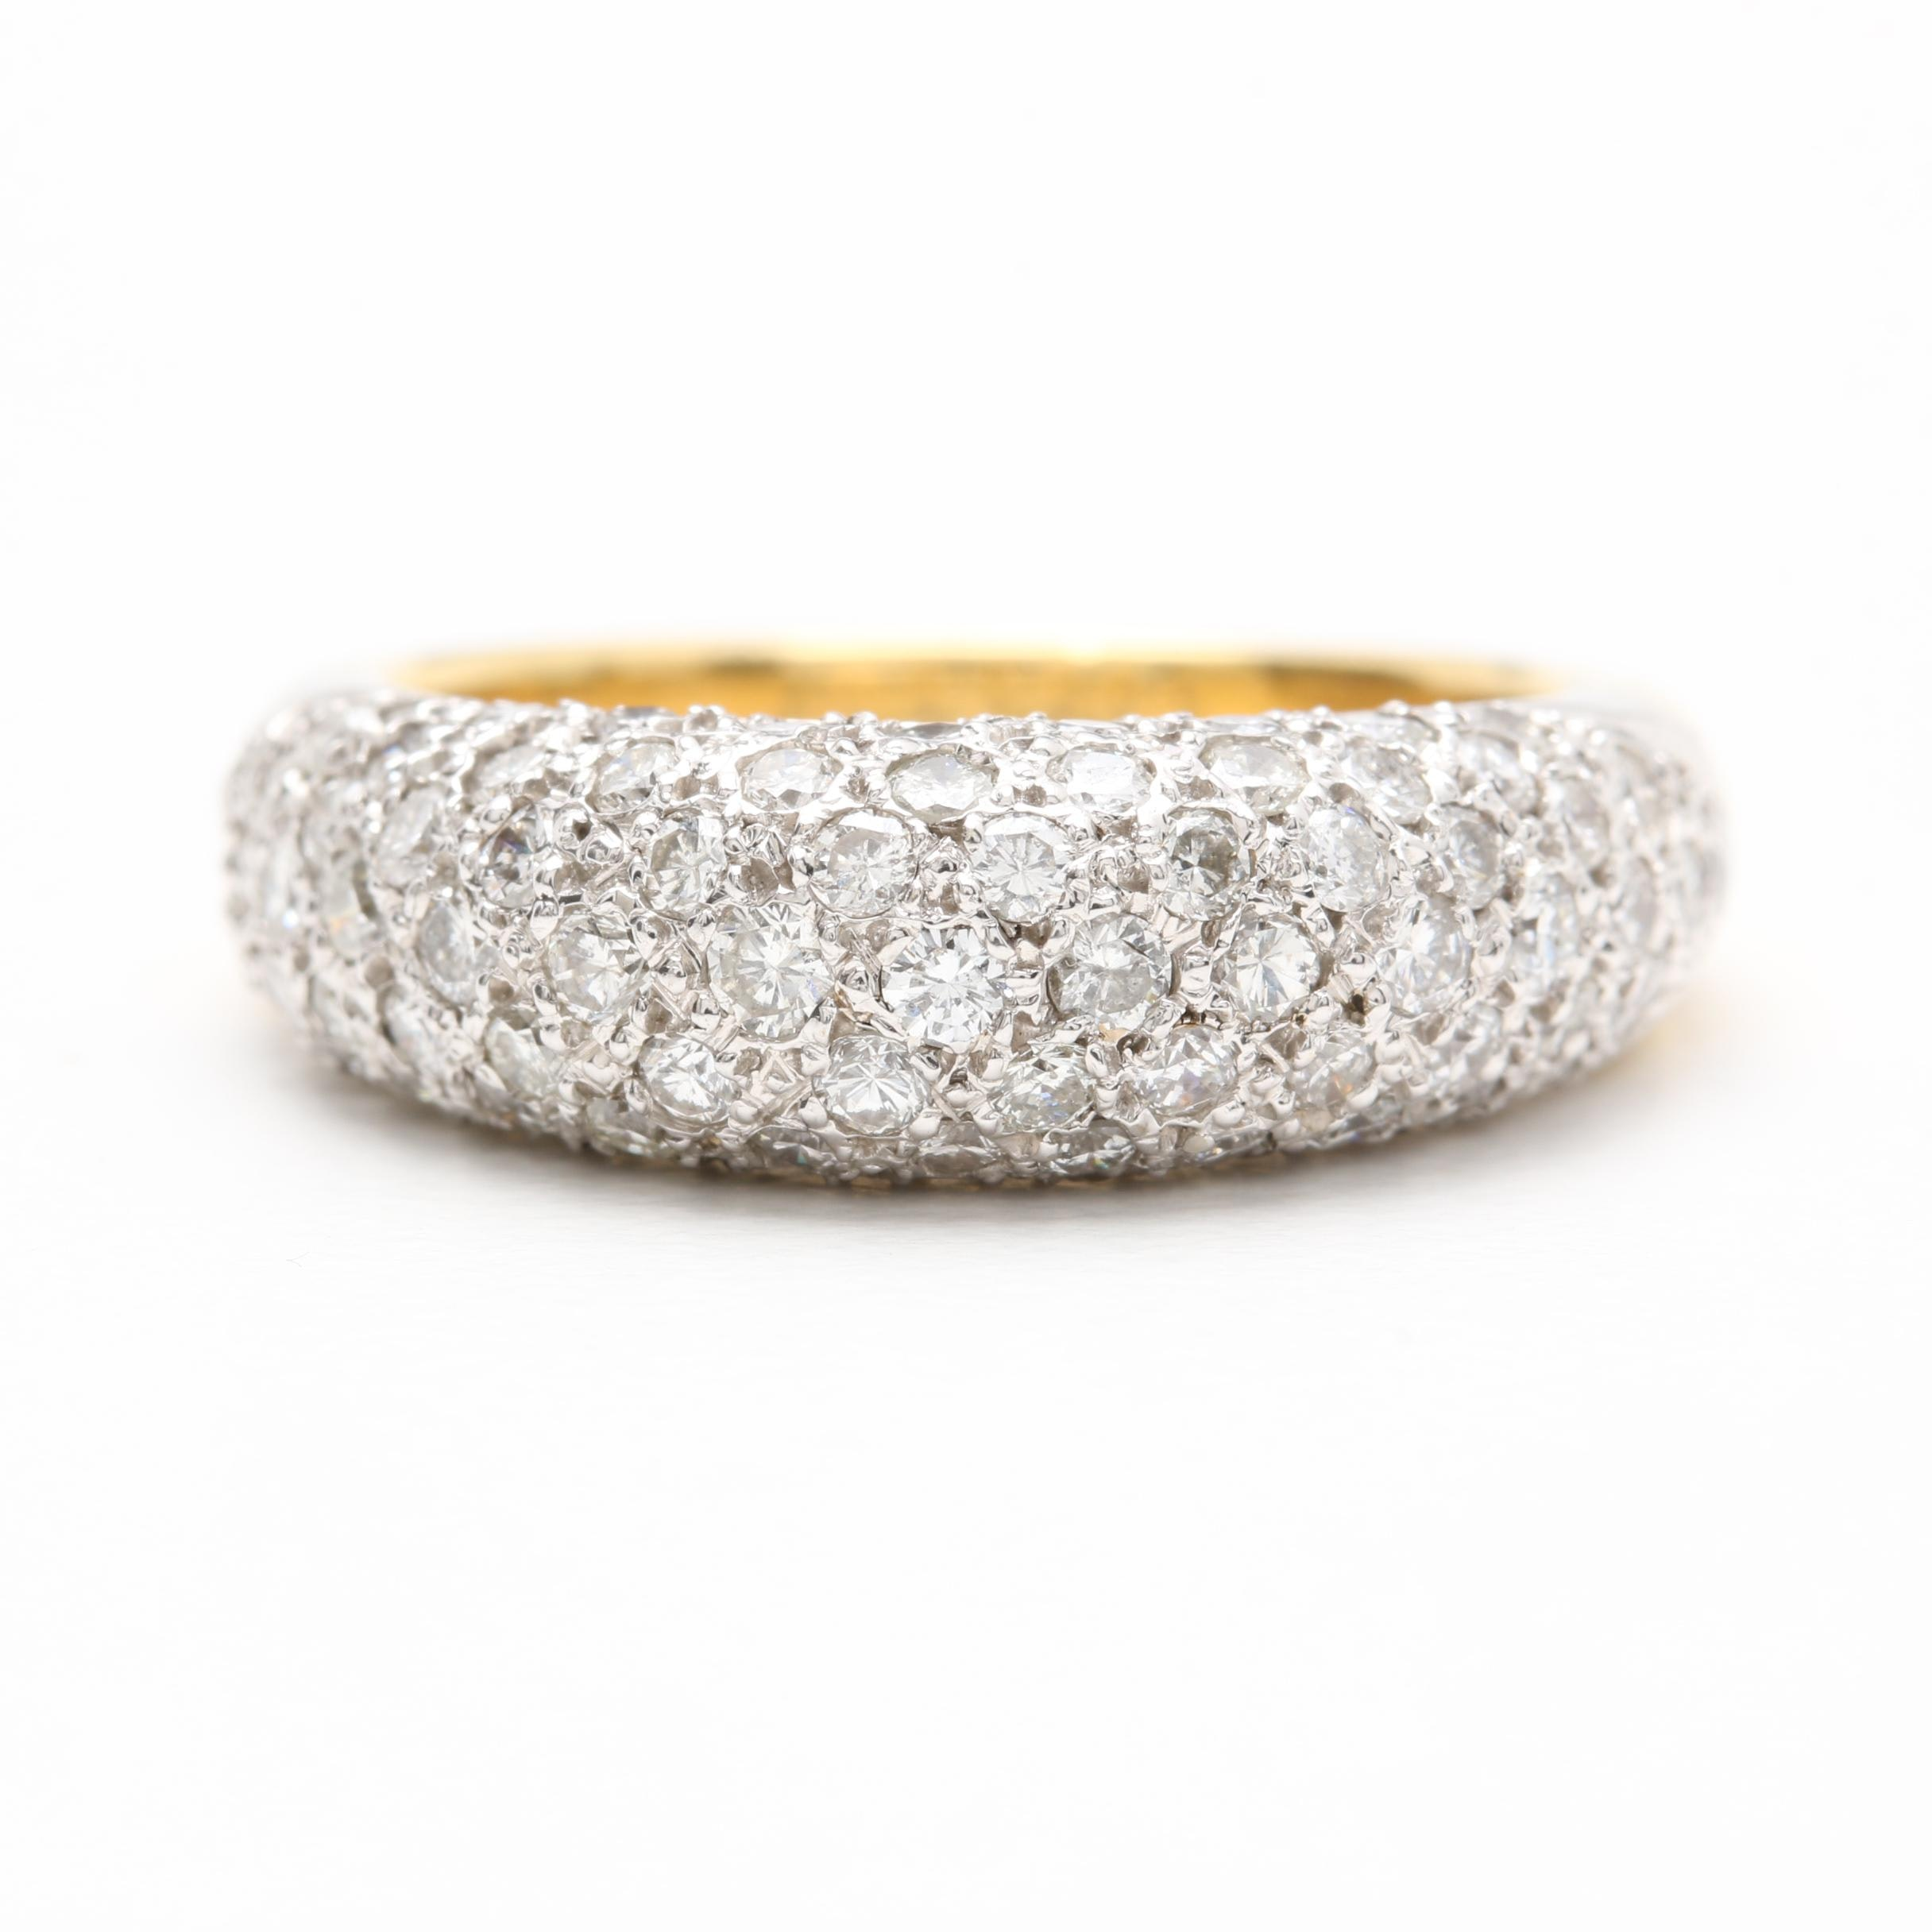 18K Yellow Gold 1.46 CTW Diamond Pavé Ring